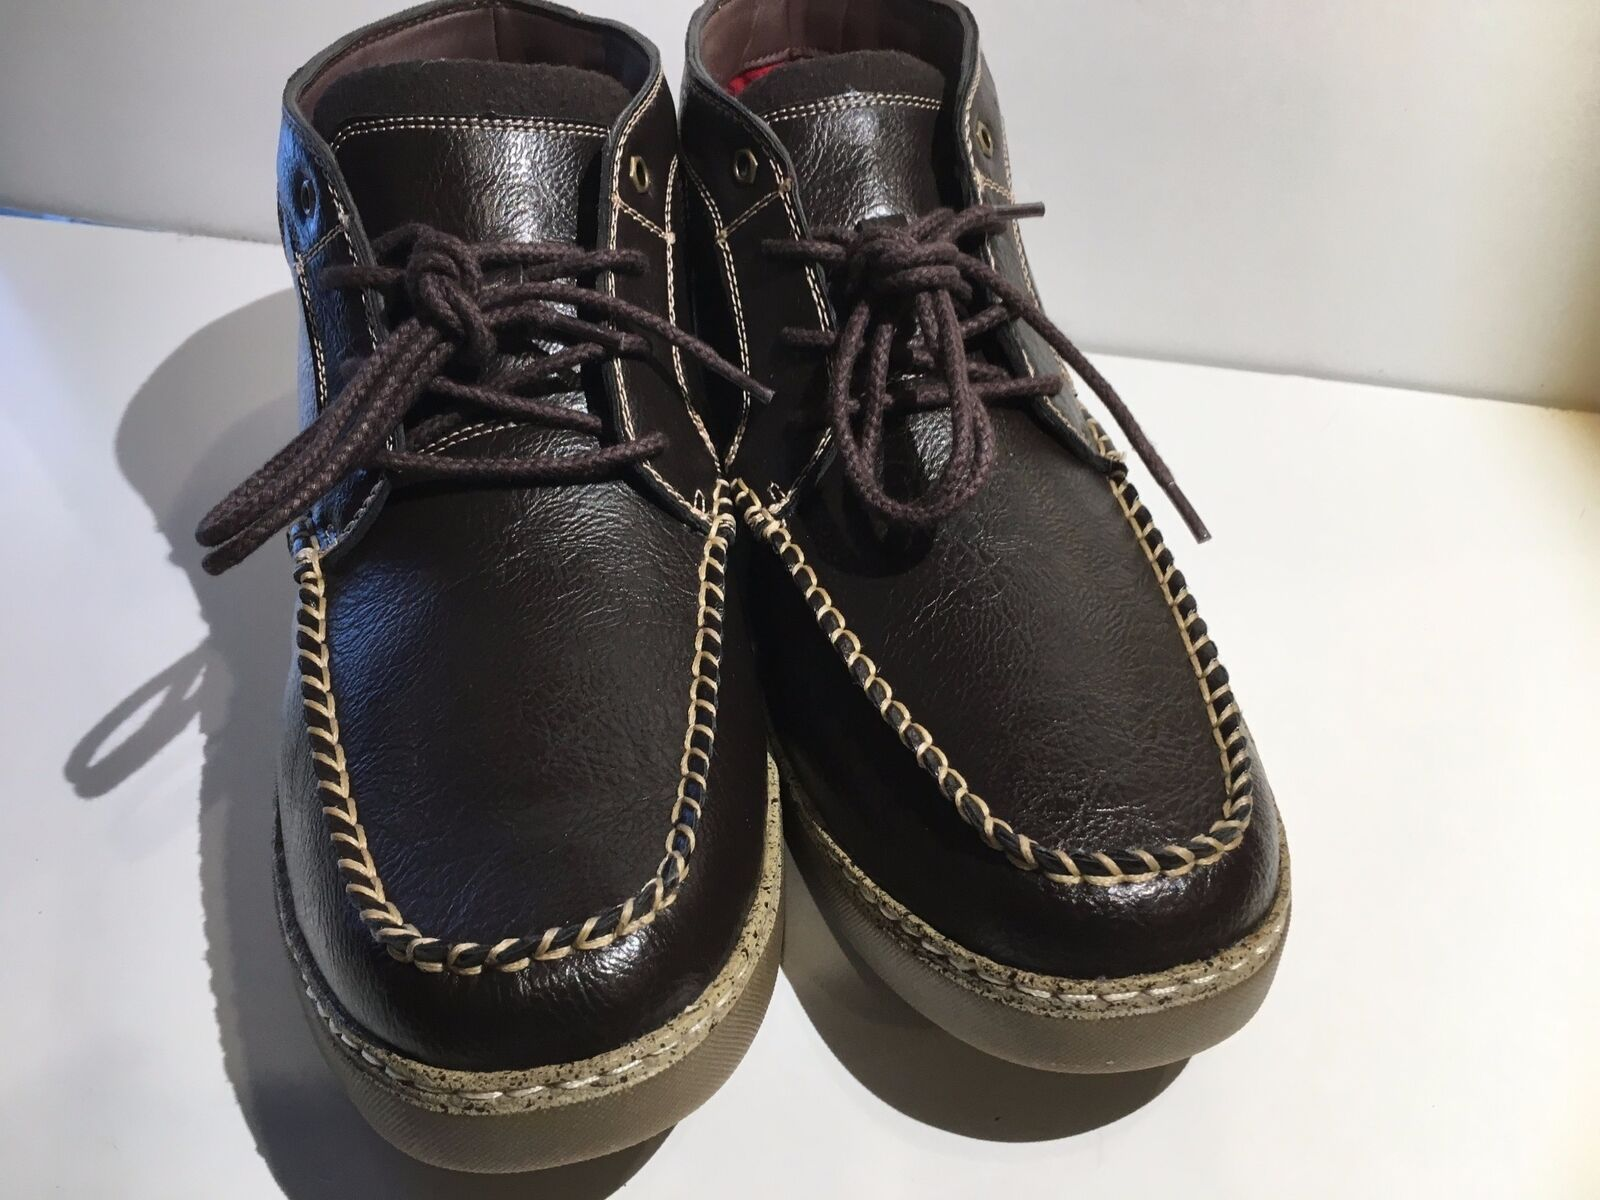 Stacy adams (1289) uomini trickster ohukka boot (1289) adams dimensioni 11.5m brown 517481